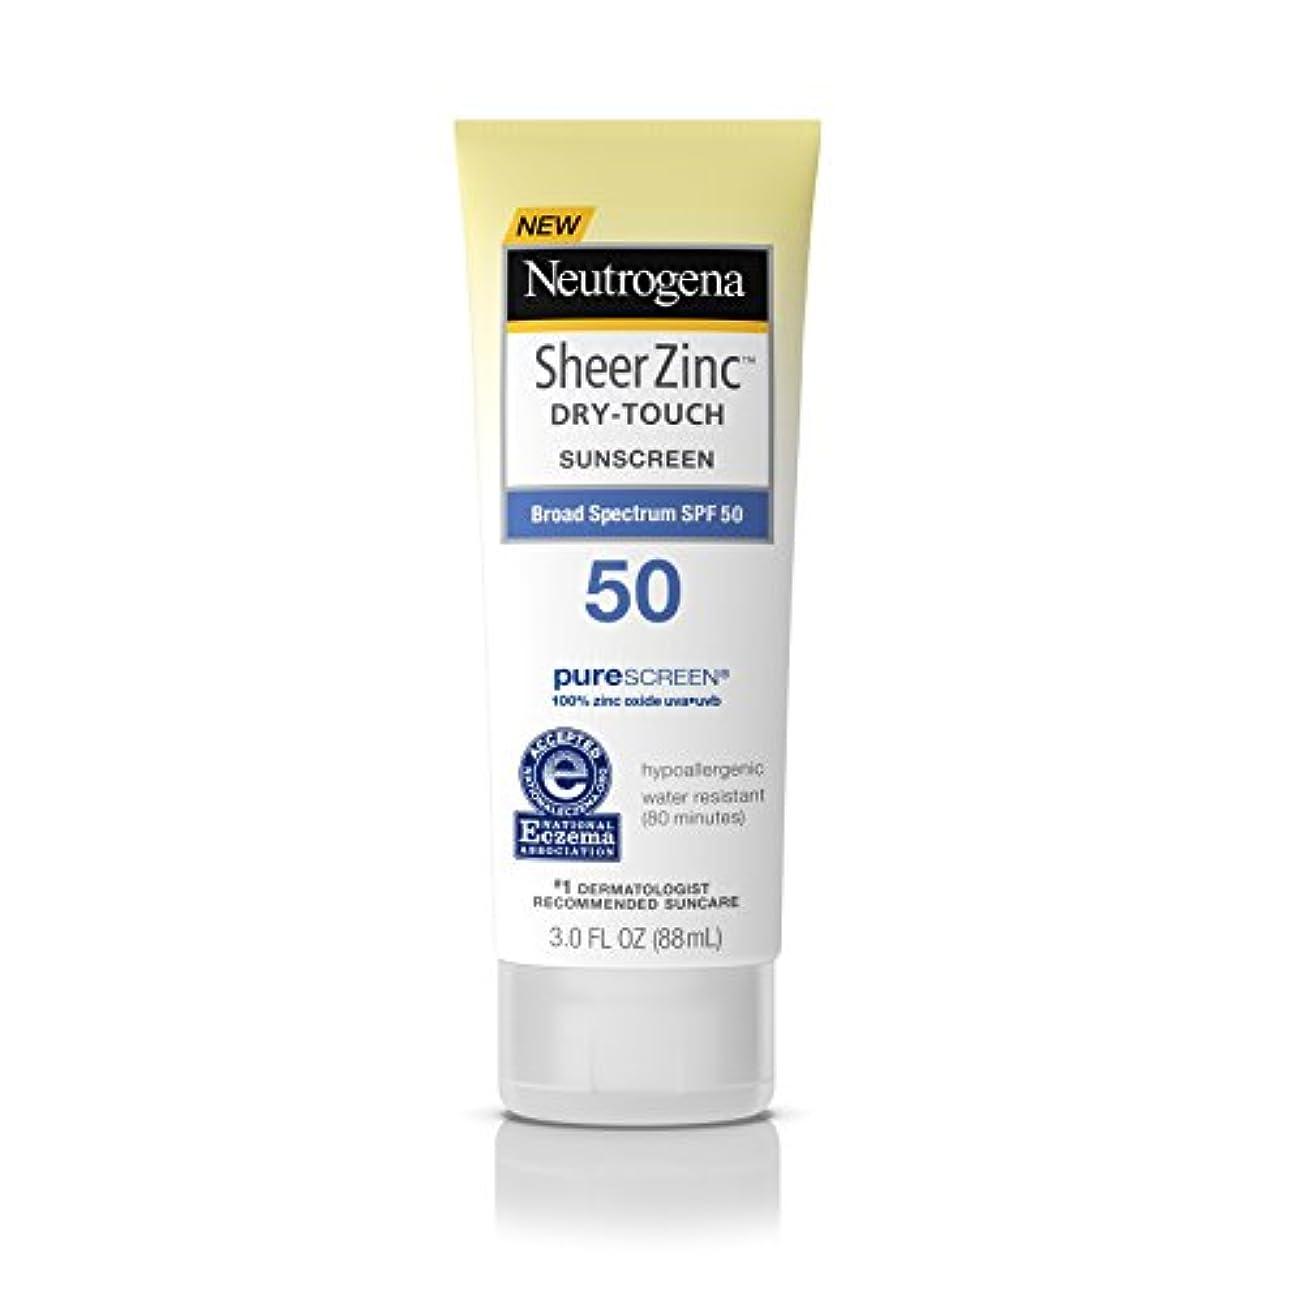 Neutrogena シアー亜鉛ドライタッチのSPF#50日焼け止め3オンス(88Ml)